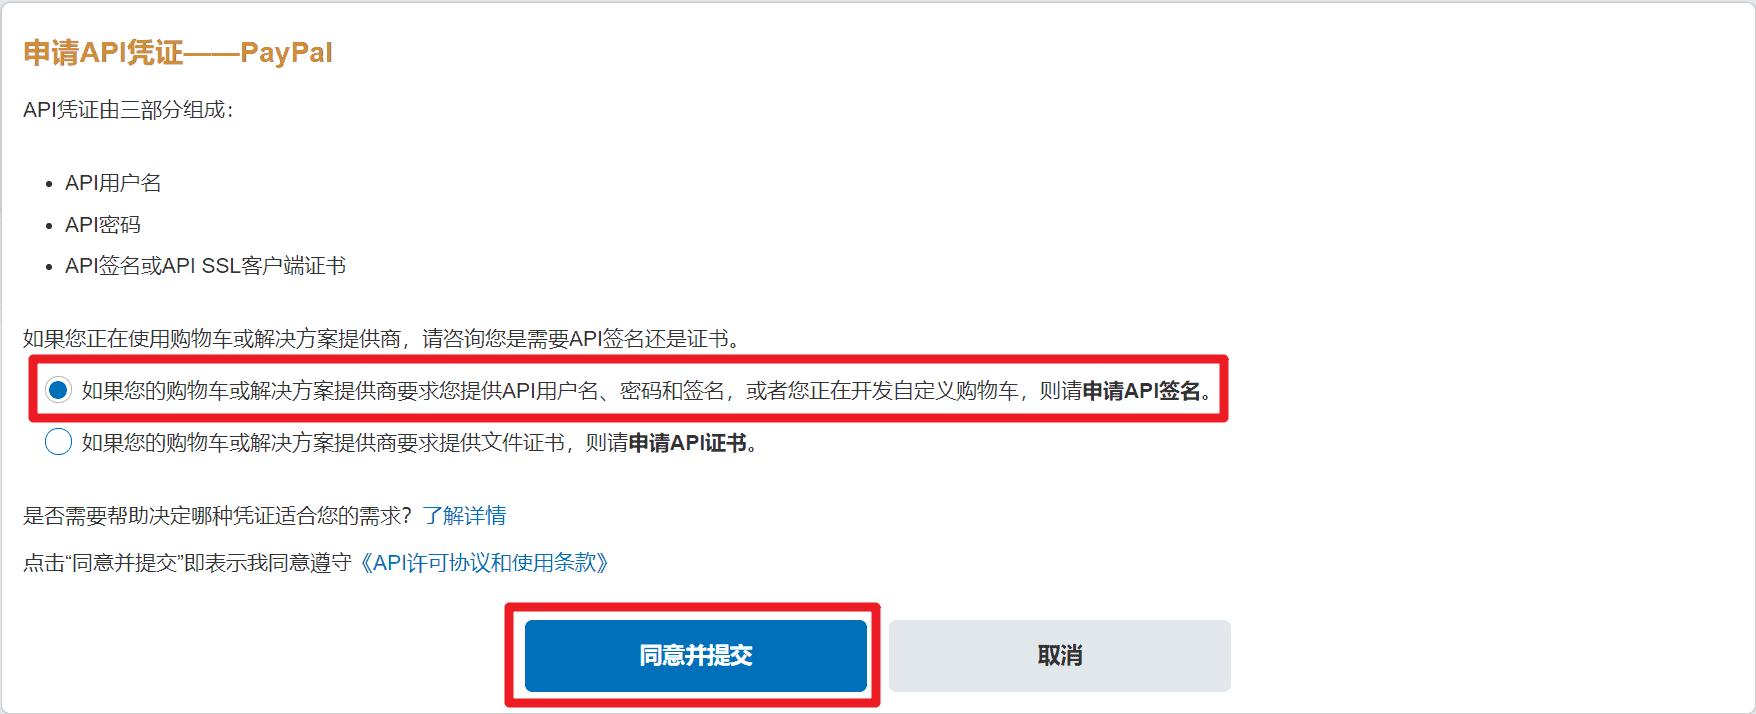 image 42 - WooCommerce支付教程:如何添加PayPal标准支付